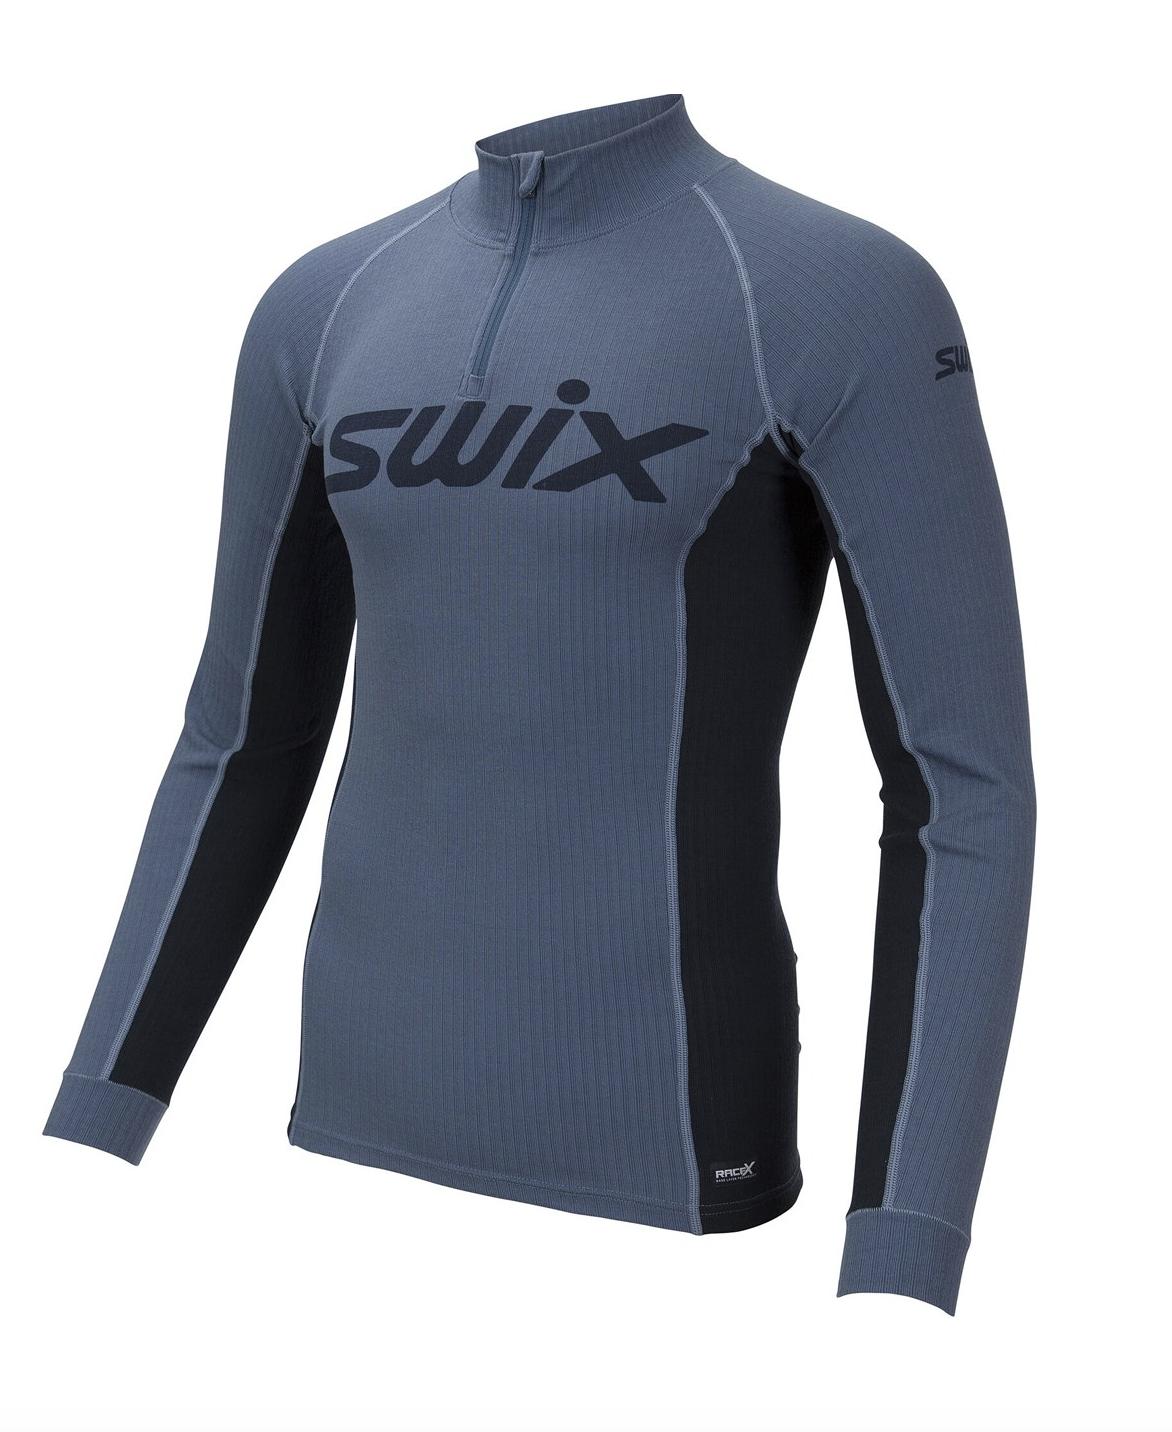 Bilde av Swix  RaceX bodyw halfzip M 72102 Blue Sea